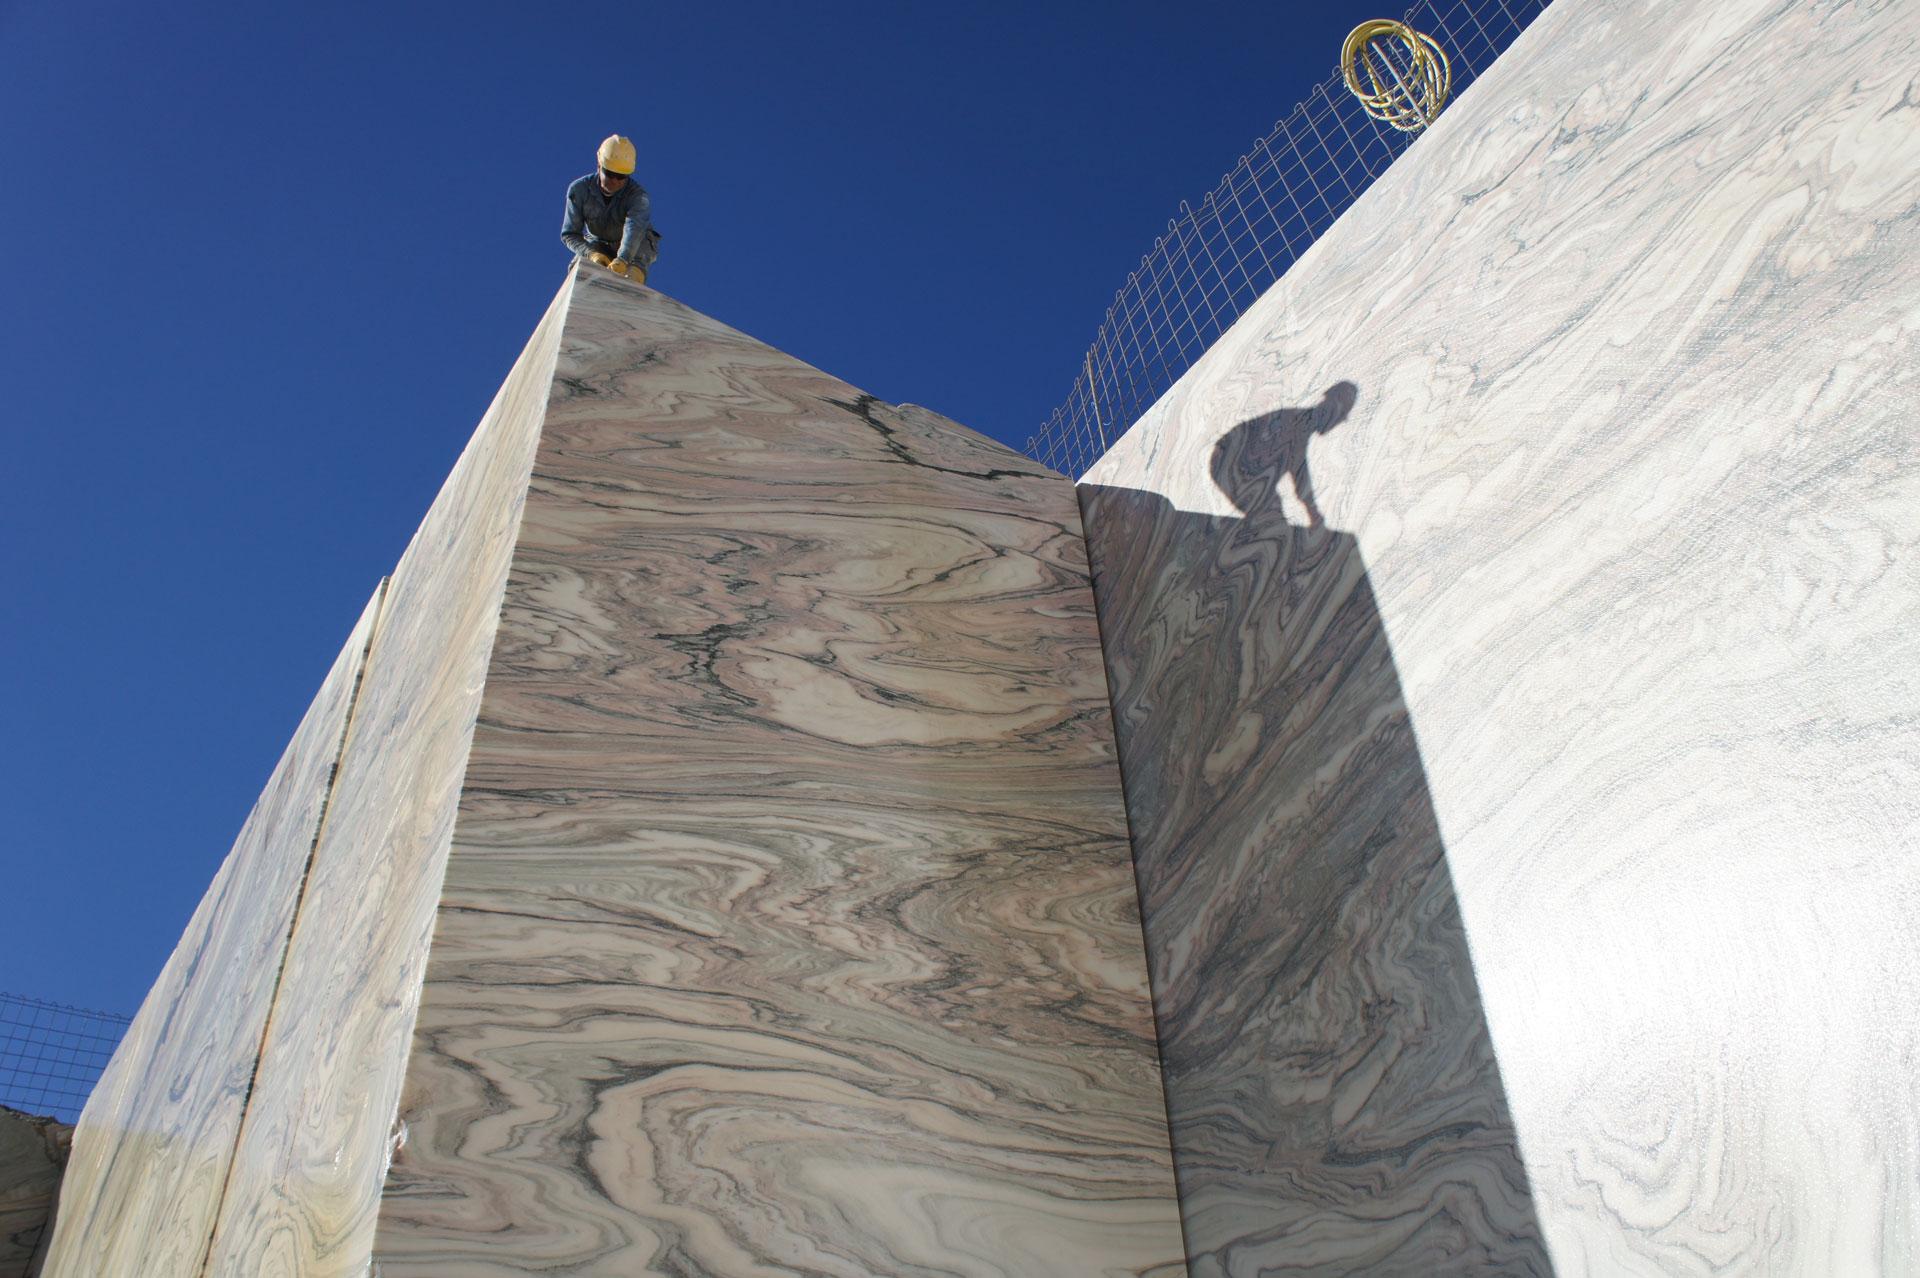 soelker-marmor-betrieb-startseite-01